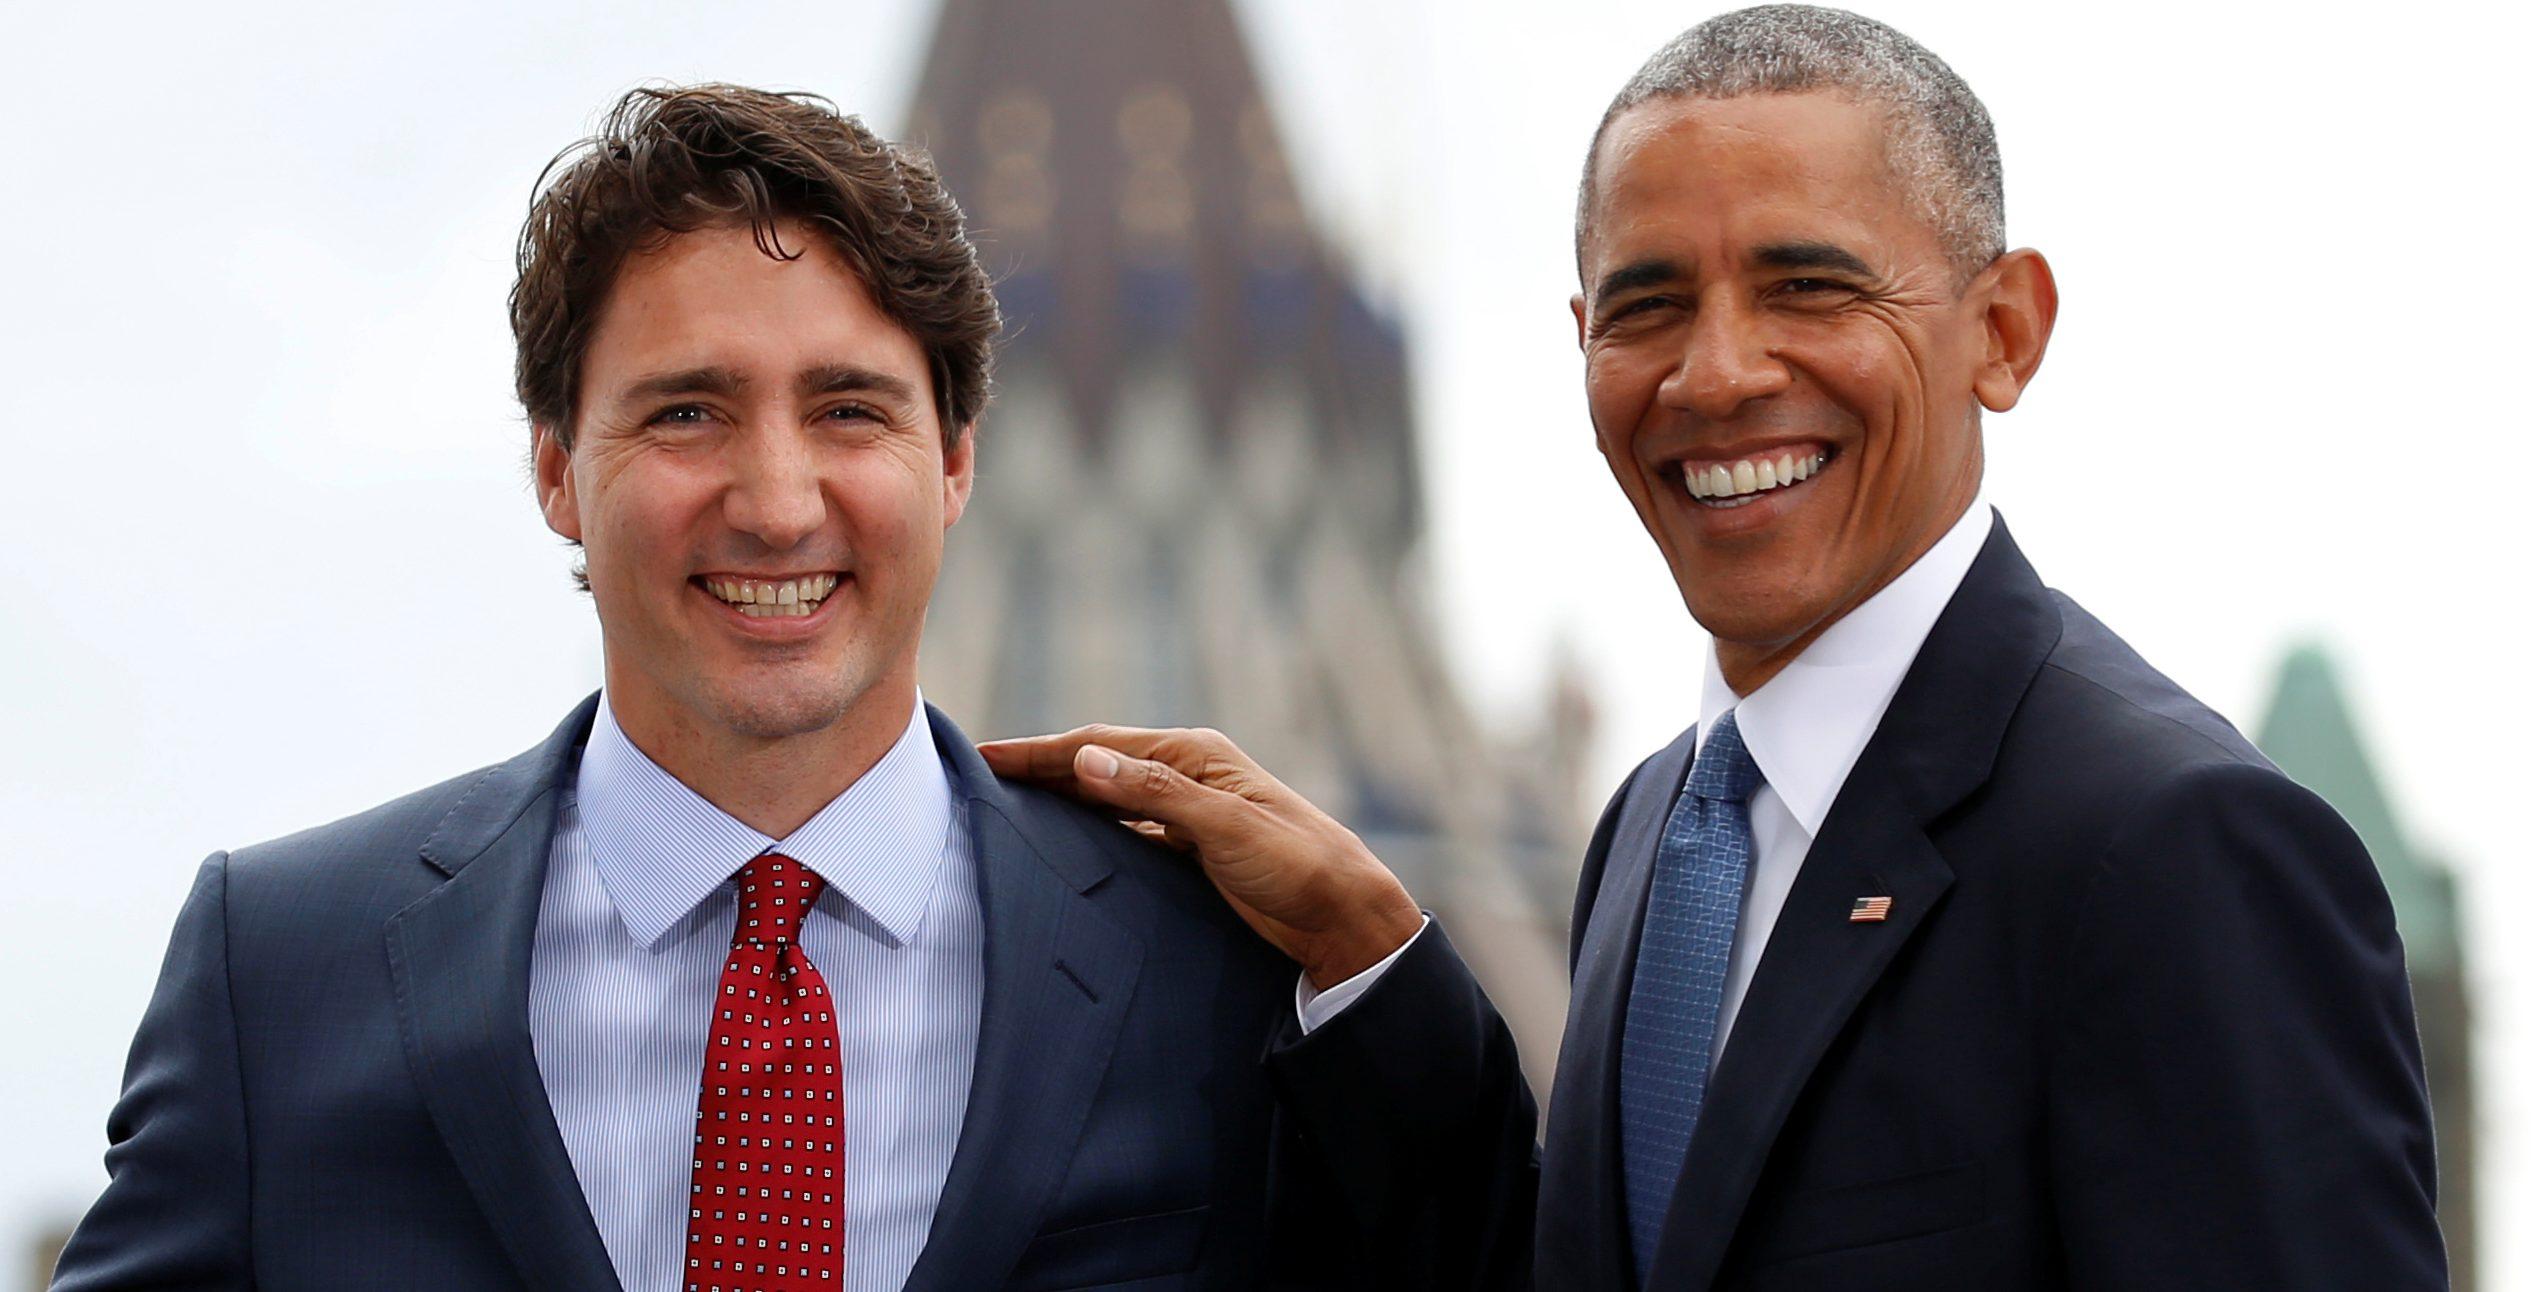 U.S. President Barack Obama and Canadian Prime Minister Justin Trudeau